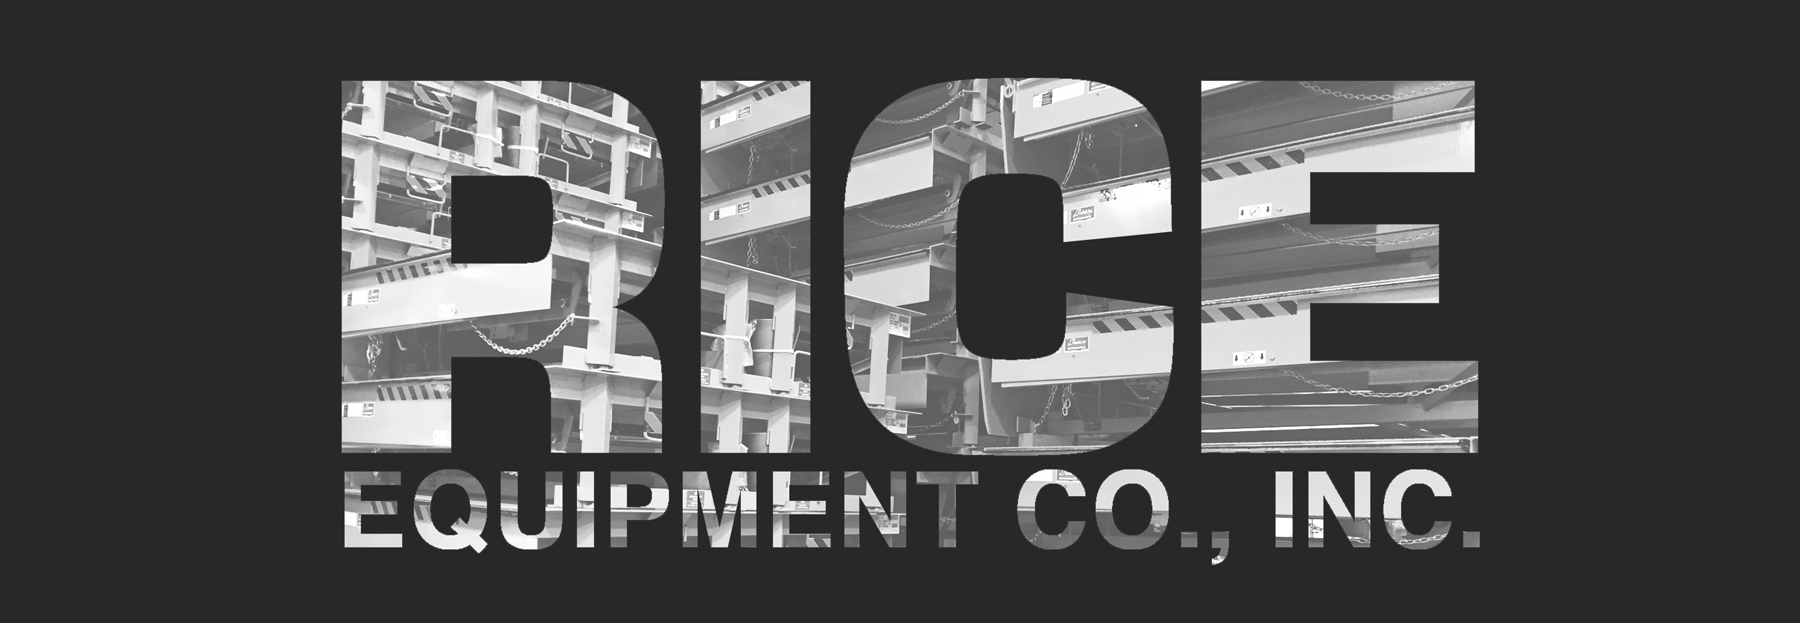 Dock Leveler Plate Repair Service Doors High Speed Material Handling Equipment St Louis MO Rice Equipment